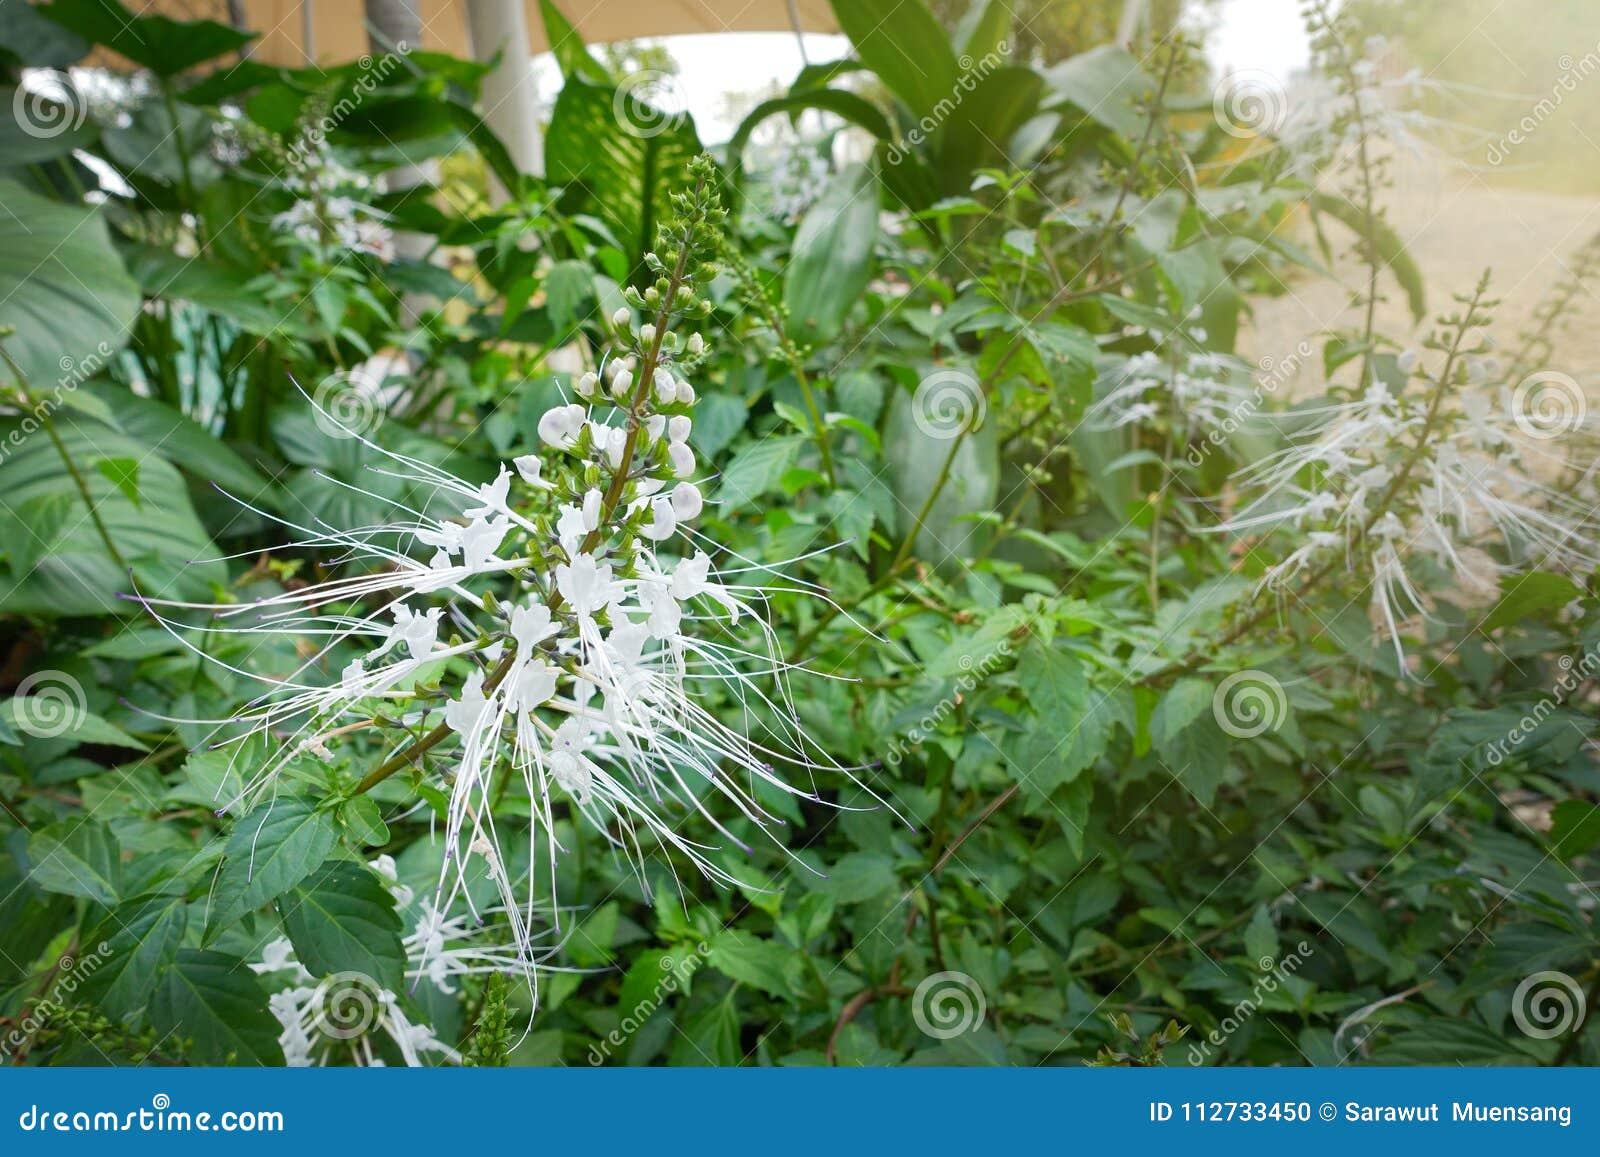 White Spider Flower In Botanical Garden Stock Photo Image Of Human